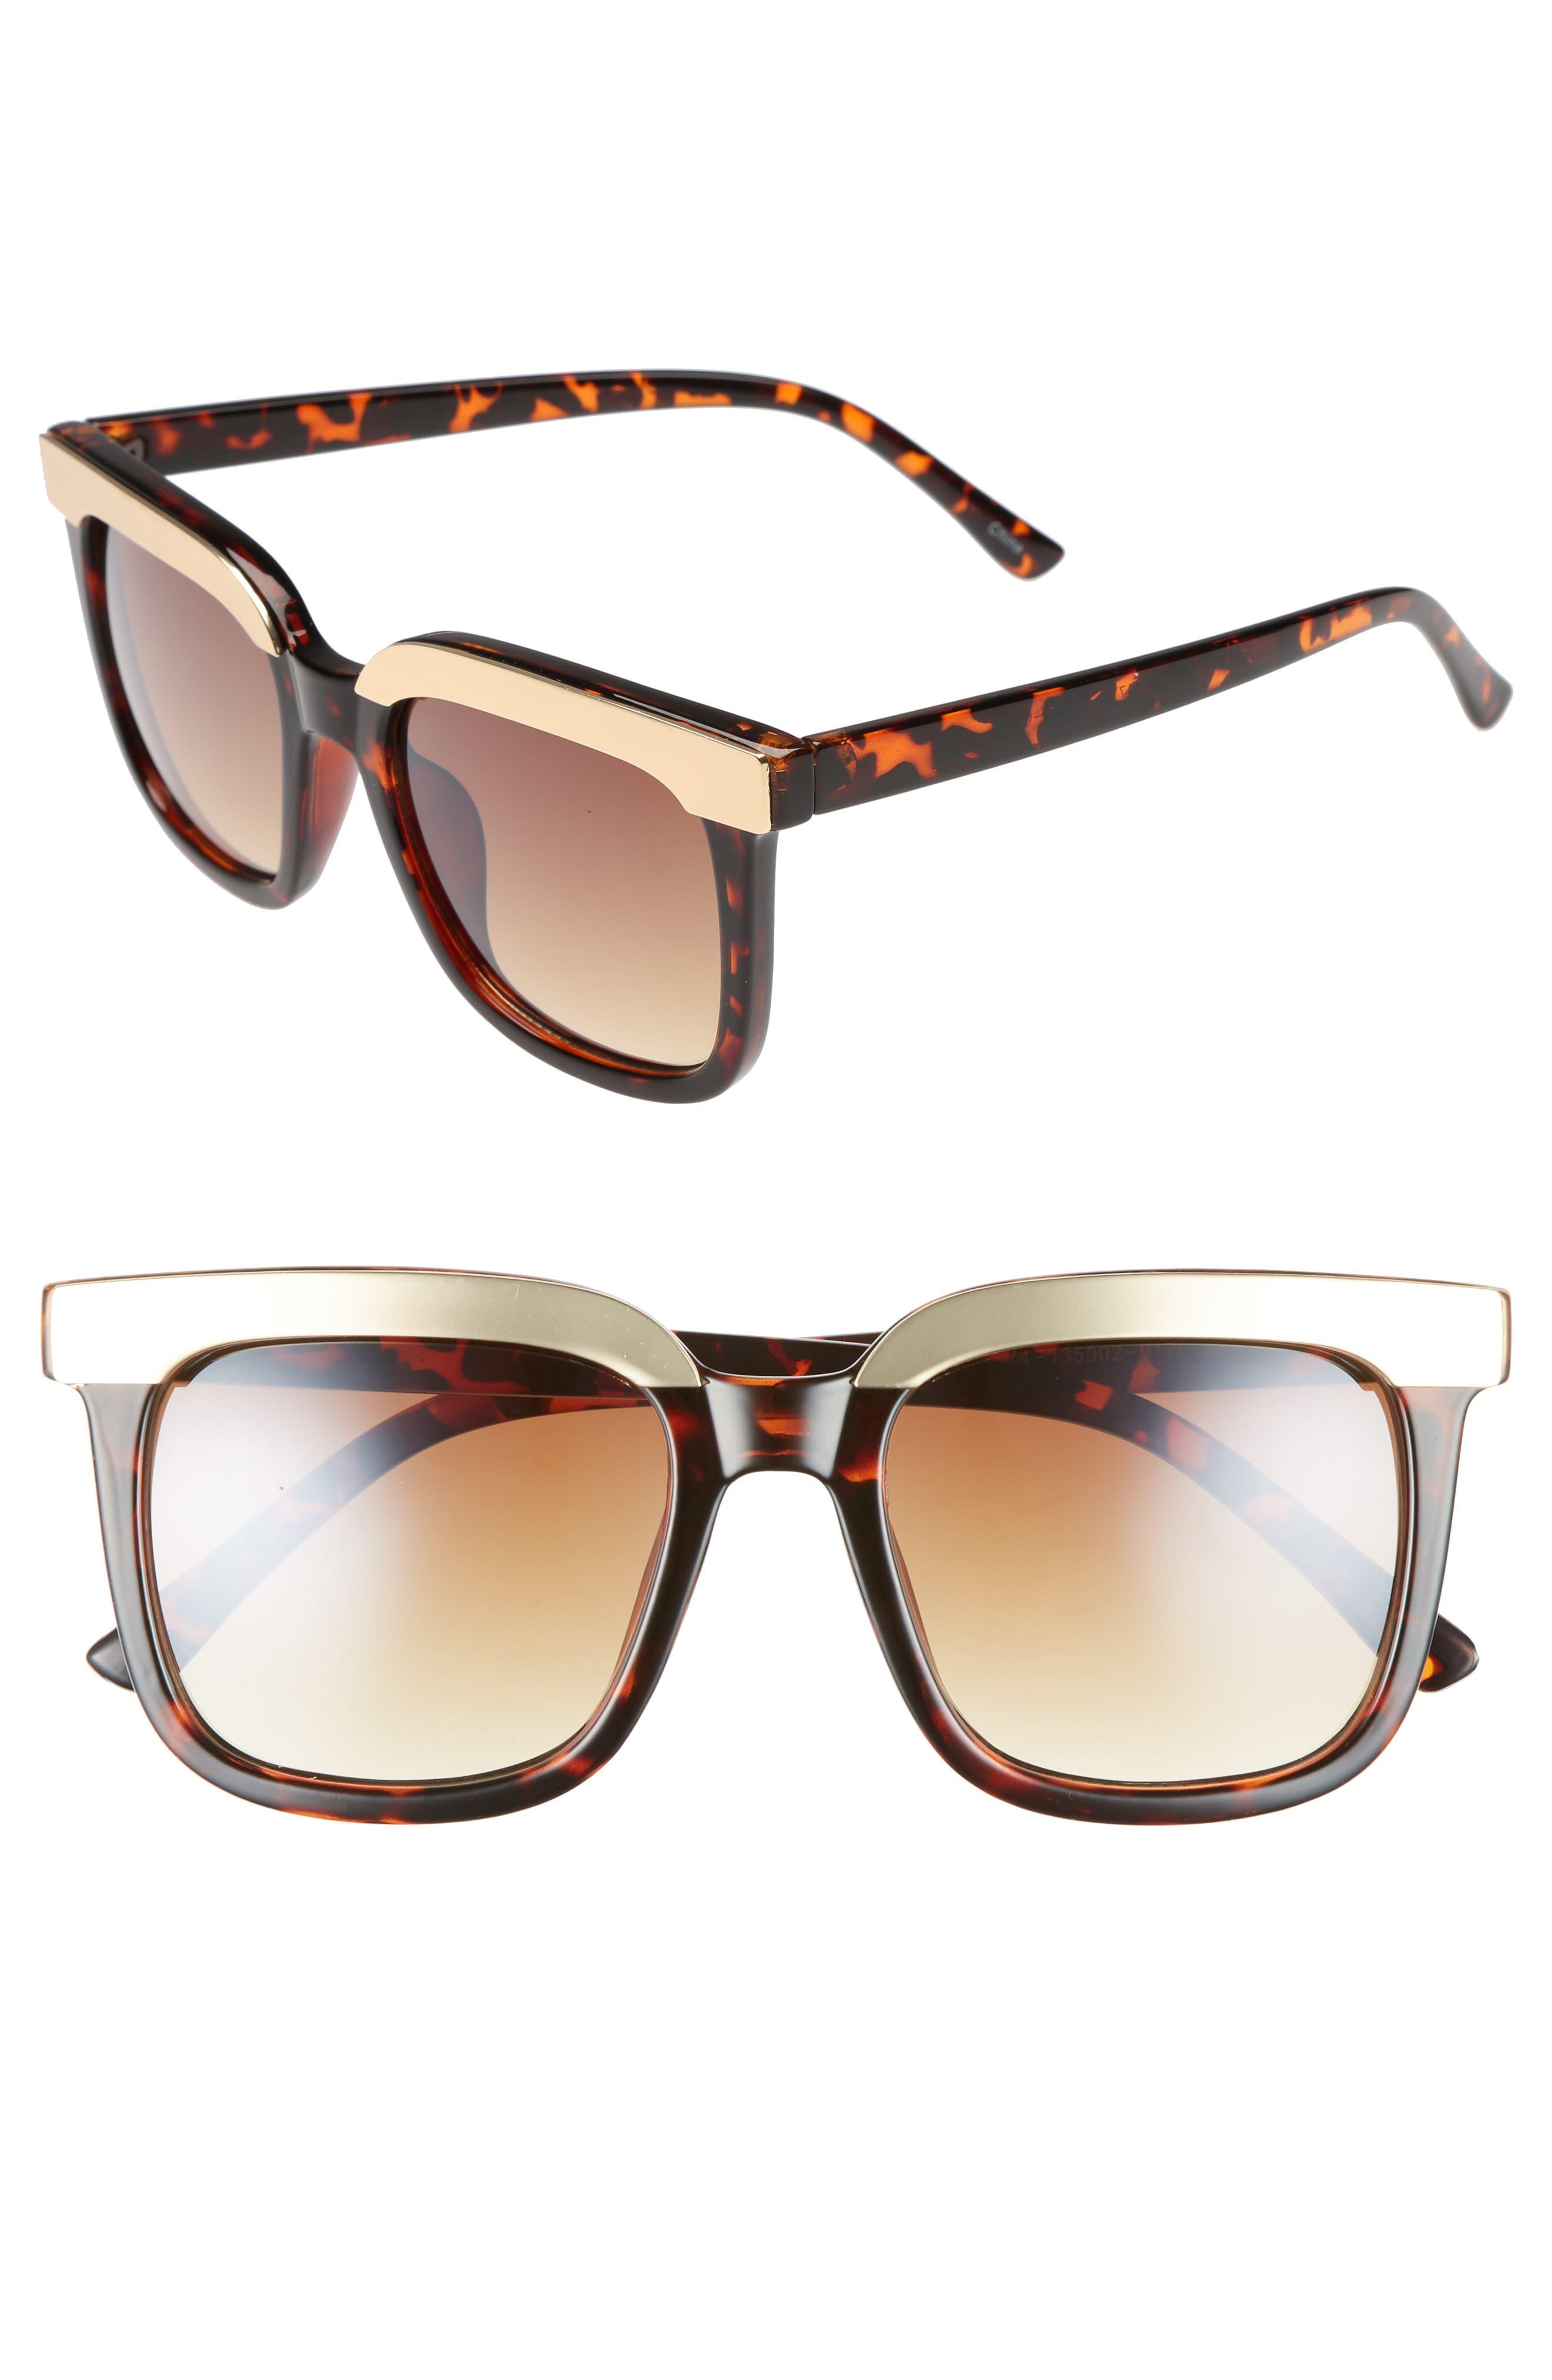 52mm Metal Dipped Square Sunglasses,                             Main thumbnail 1, color,